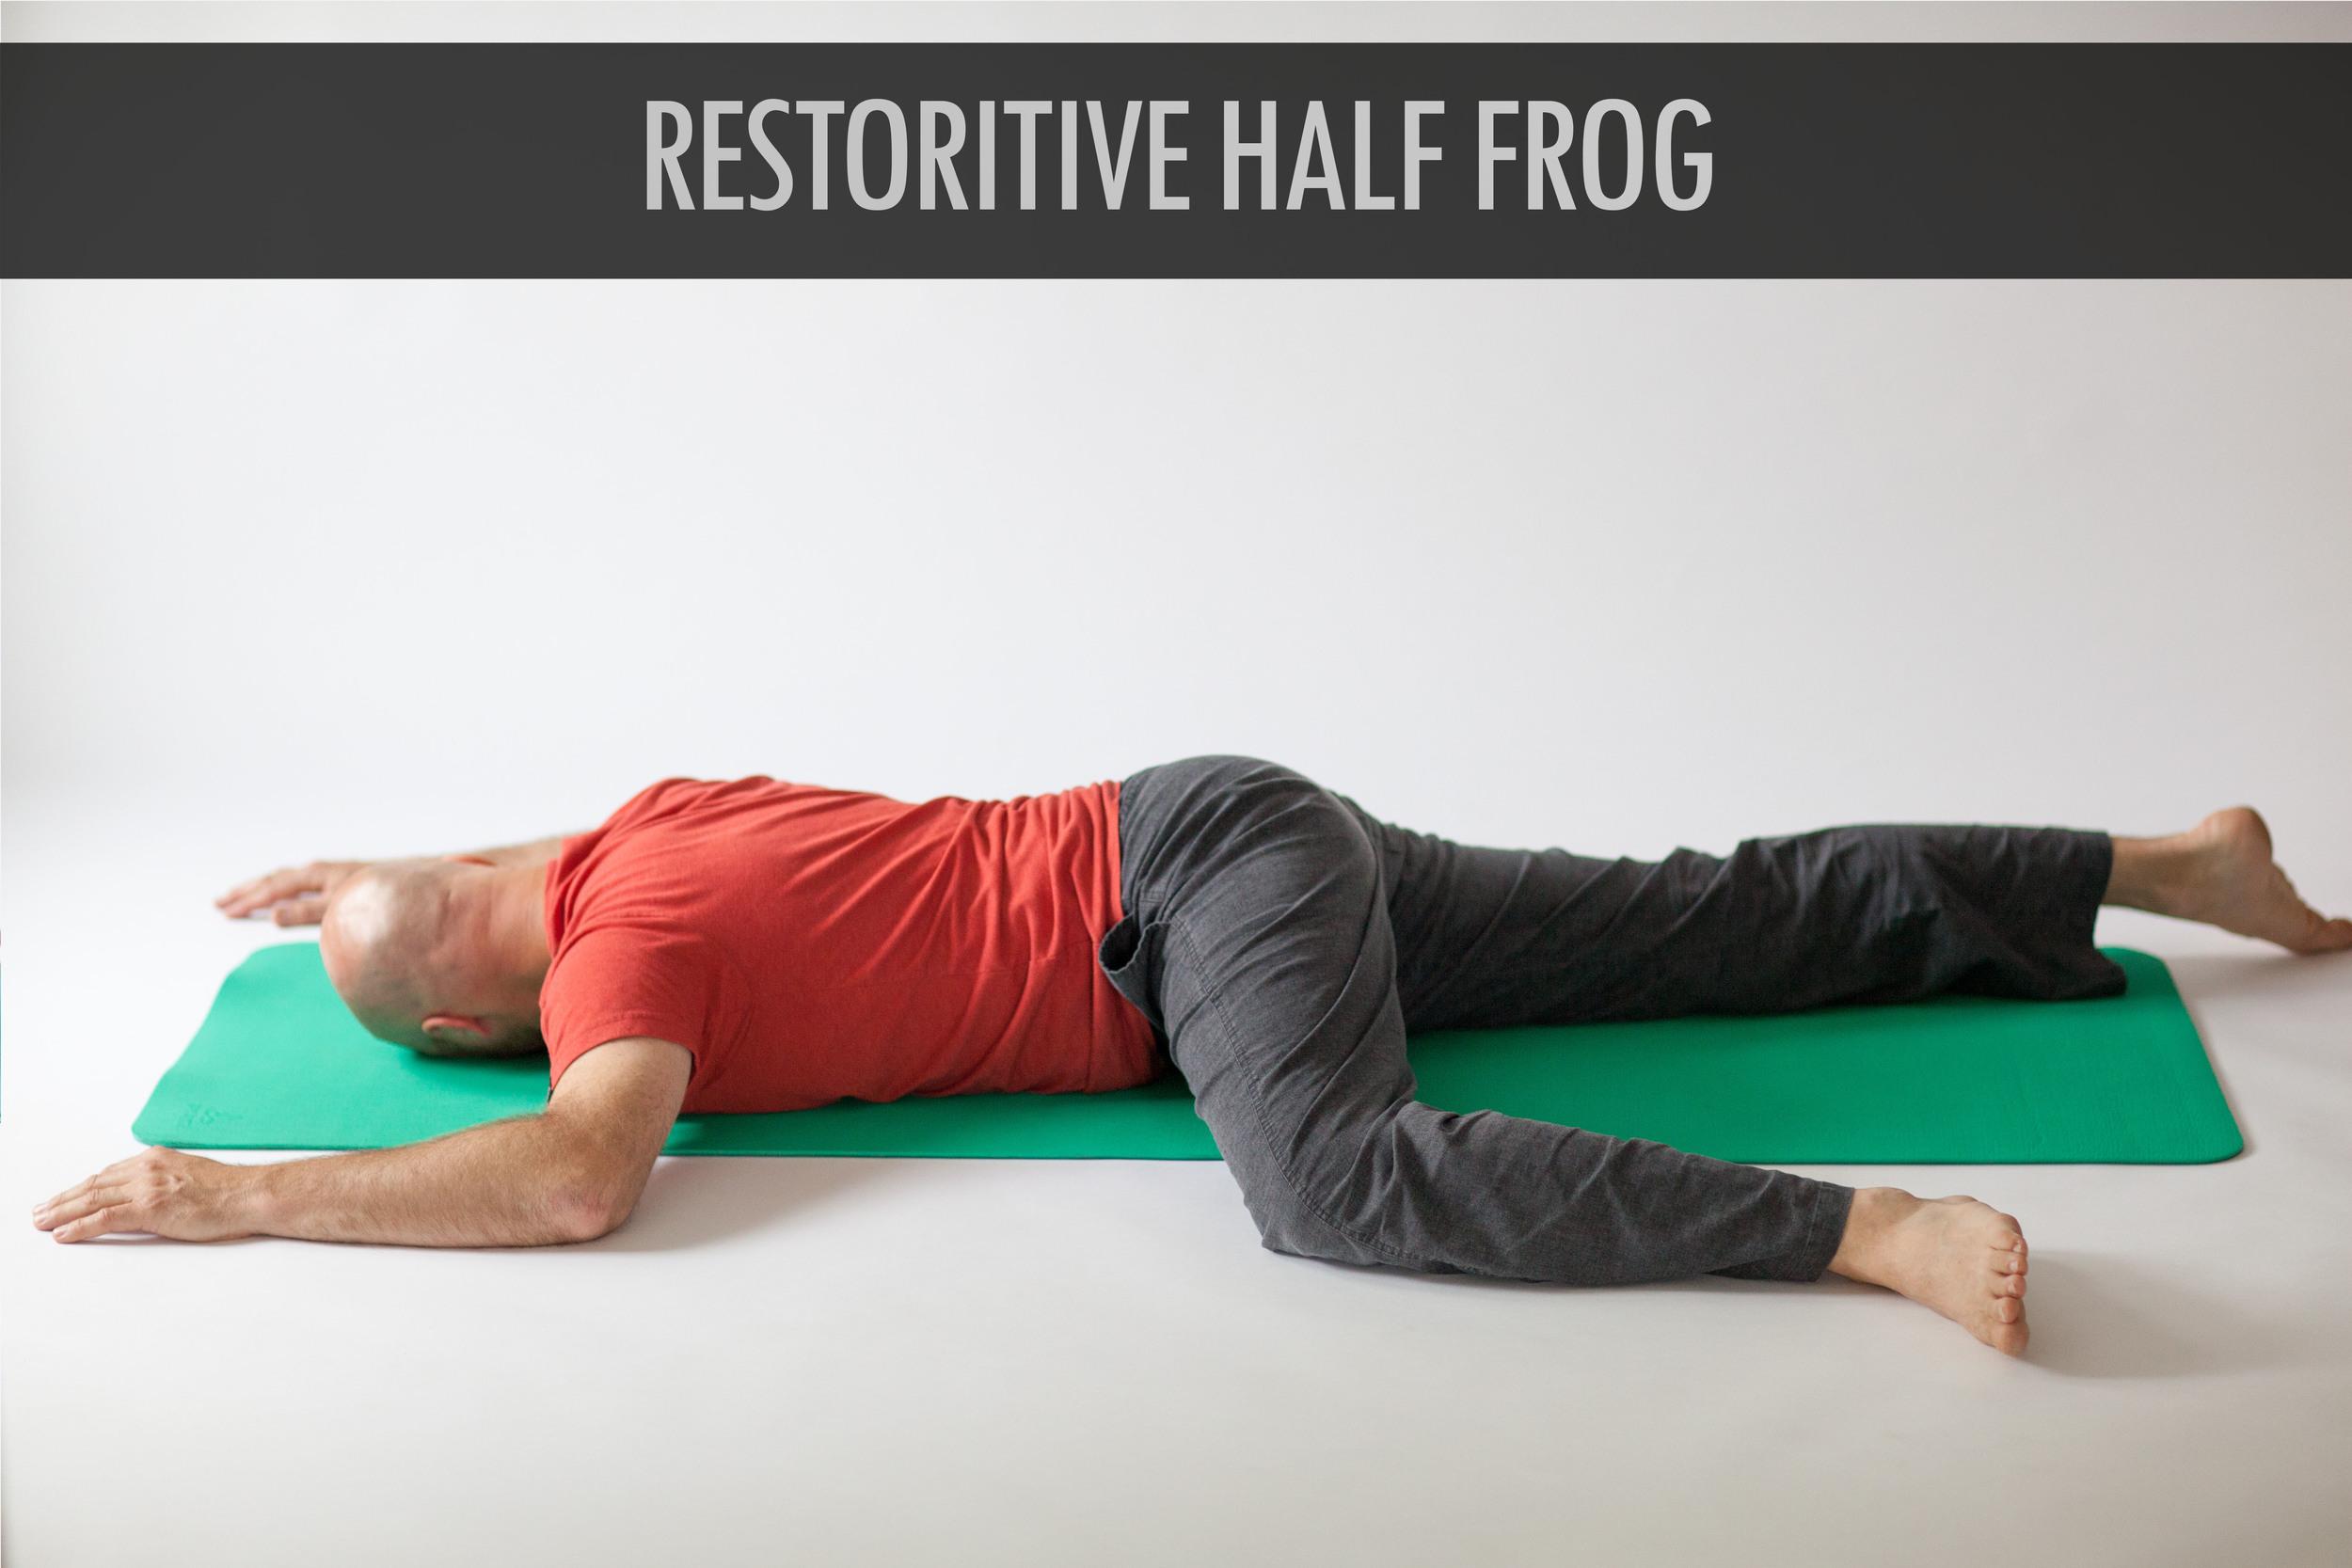 Restoritive Half Frog.jpg